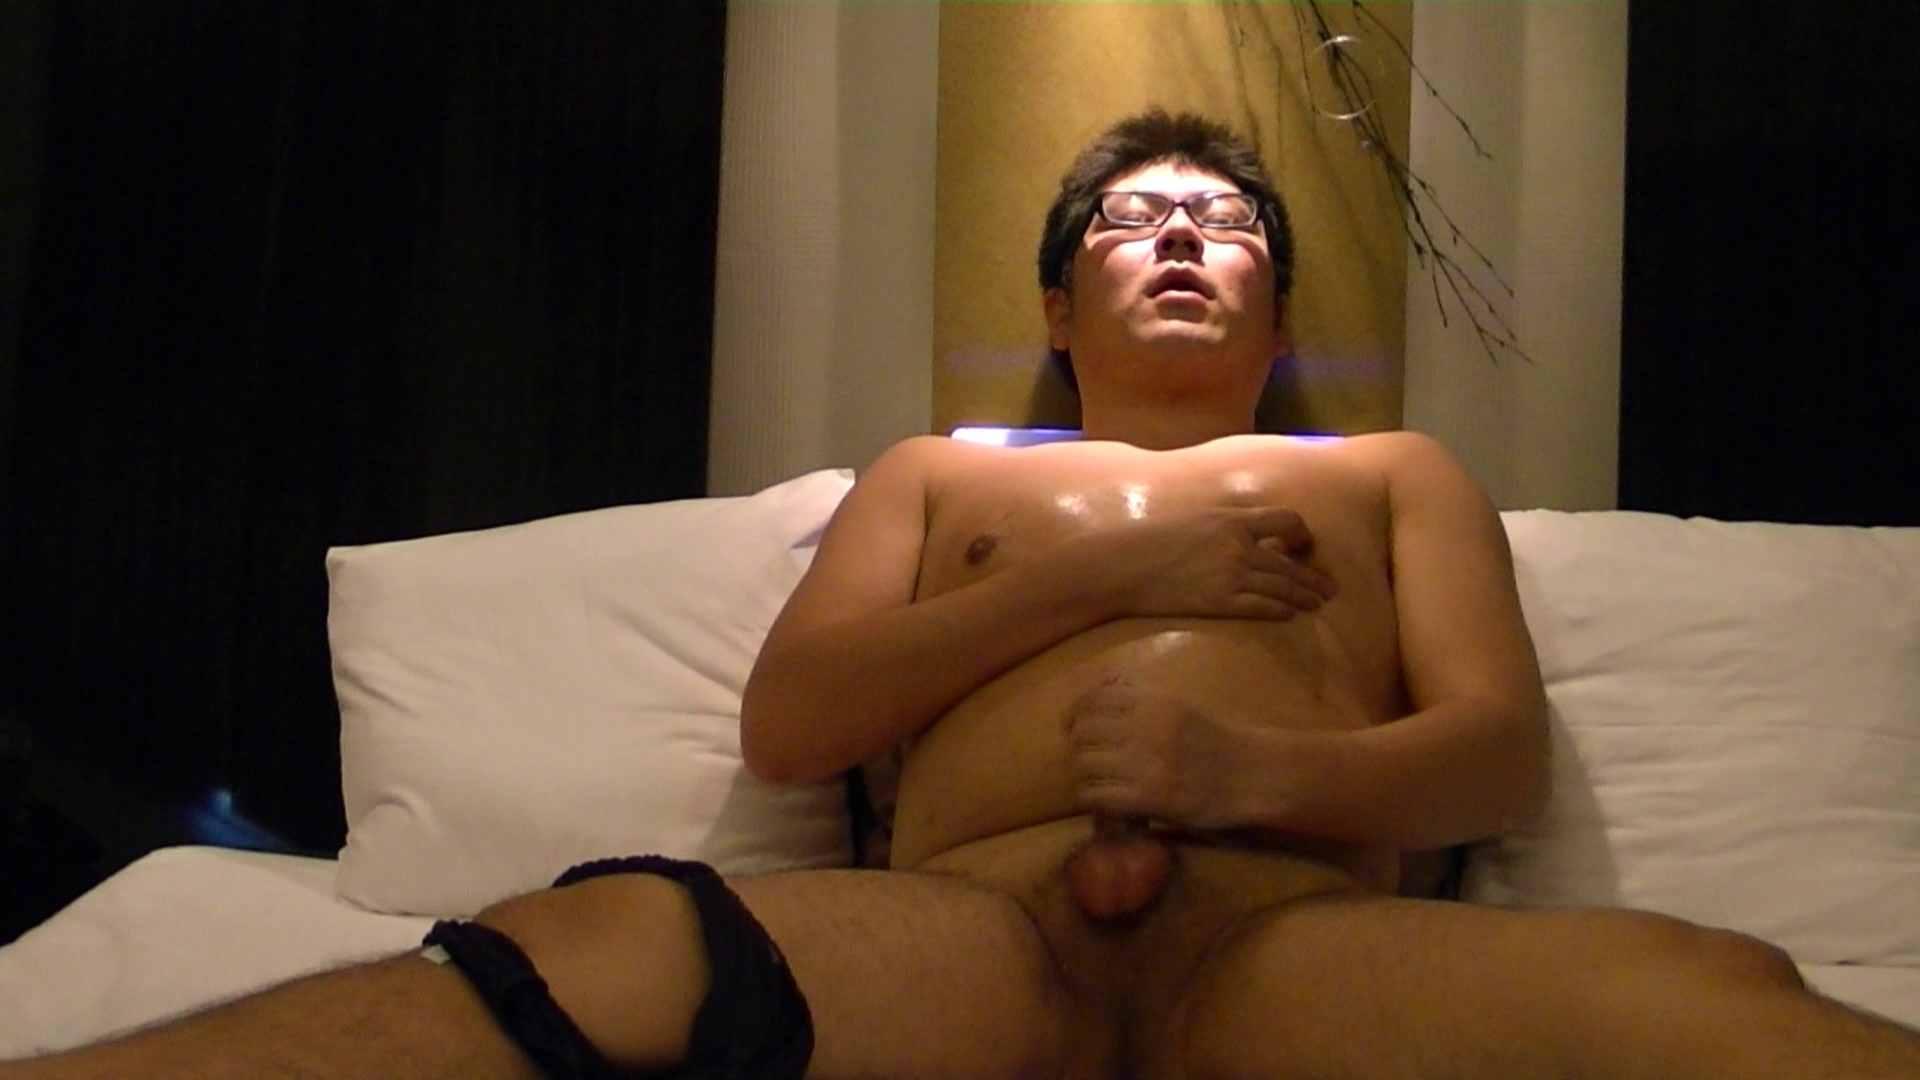 Mr.オナックスさん投稿!HD 貴方のオナニー三万円で撮影させてください。VOL.02 前編 ガチムチマッチョ系 ゲイ無修正ビデオ画像 105連発 11